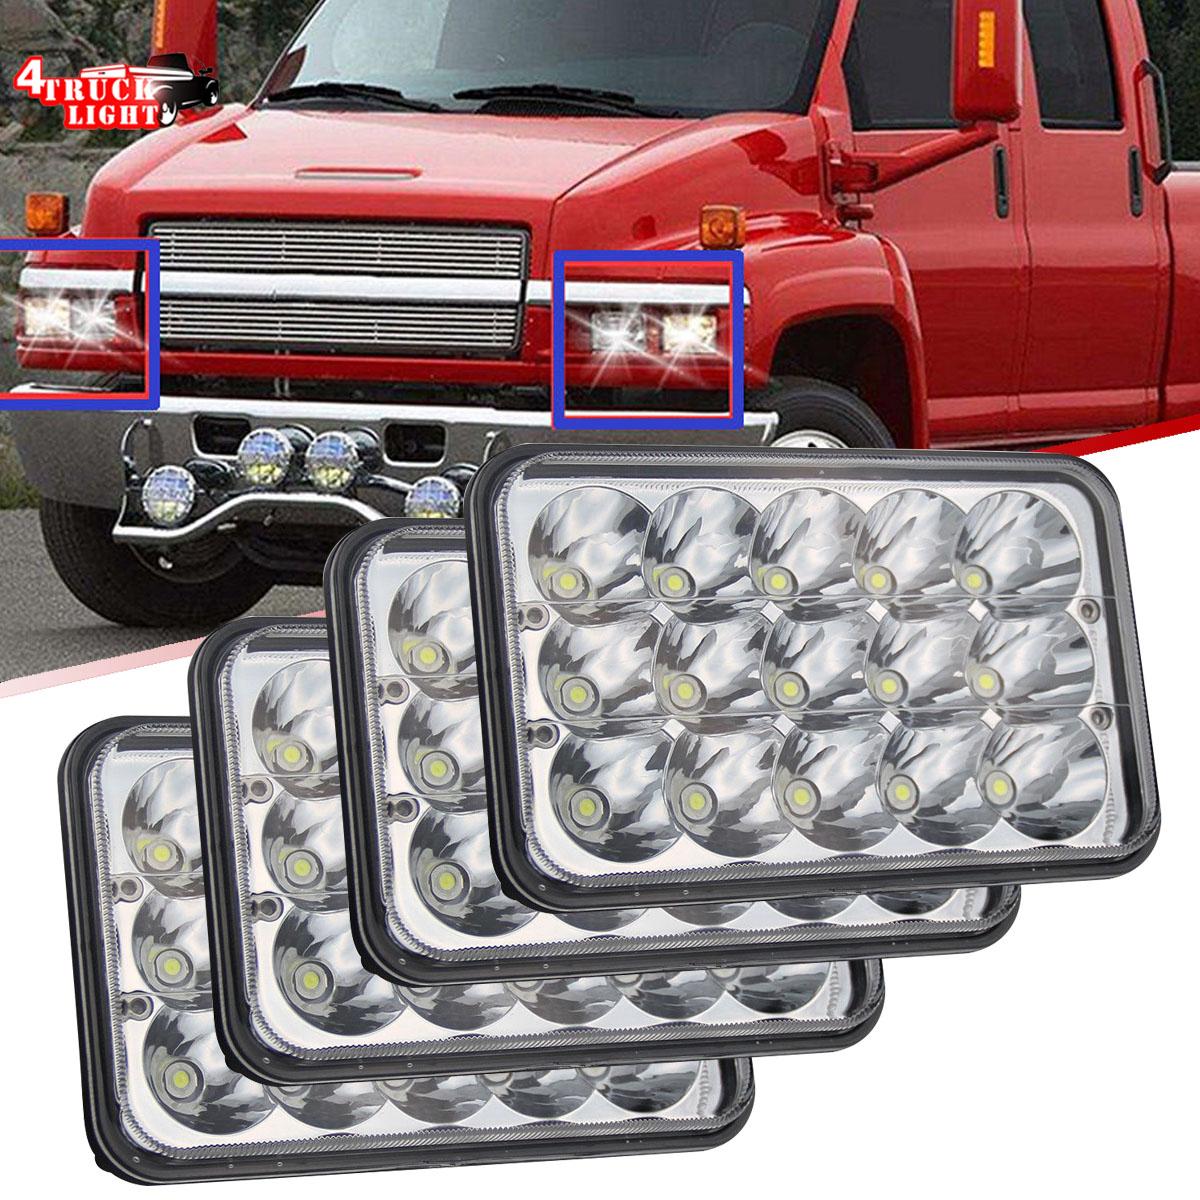 4x6 LED Headlights Upgrade For Chevrolet Kodiak C4500 and C5500 2003-2009 Models